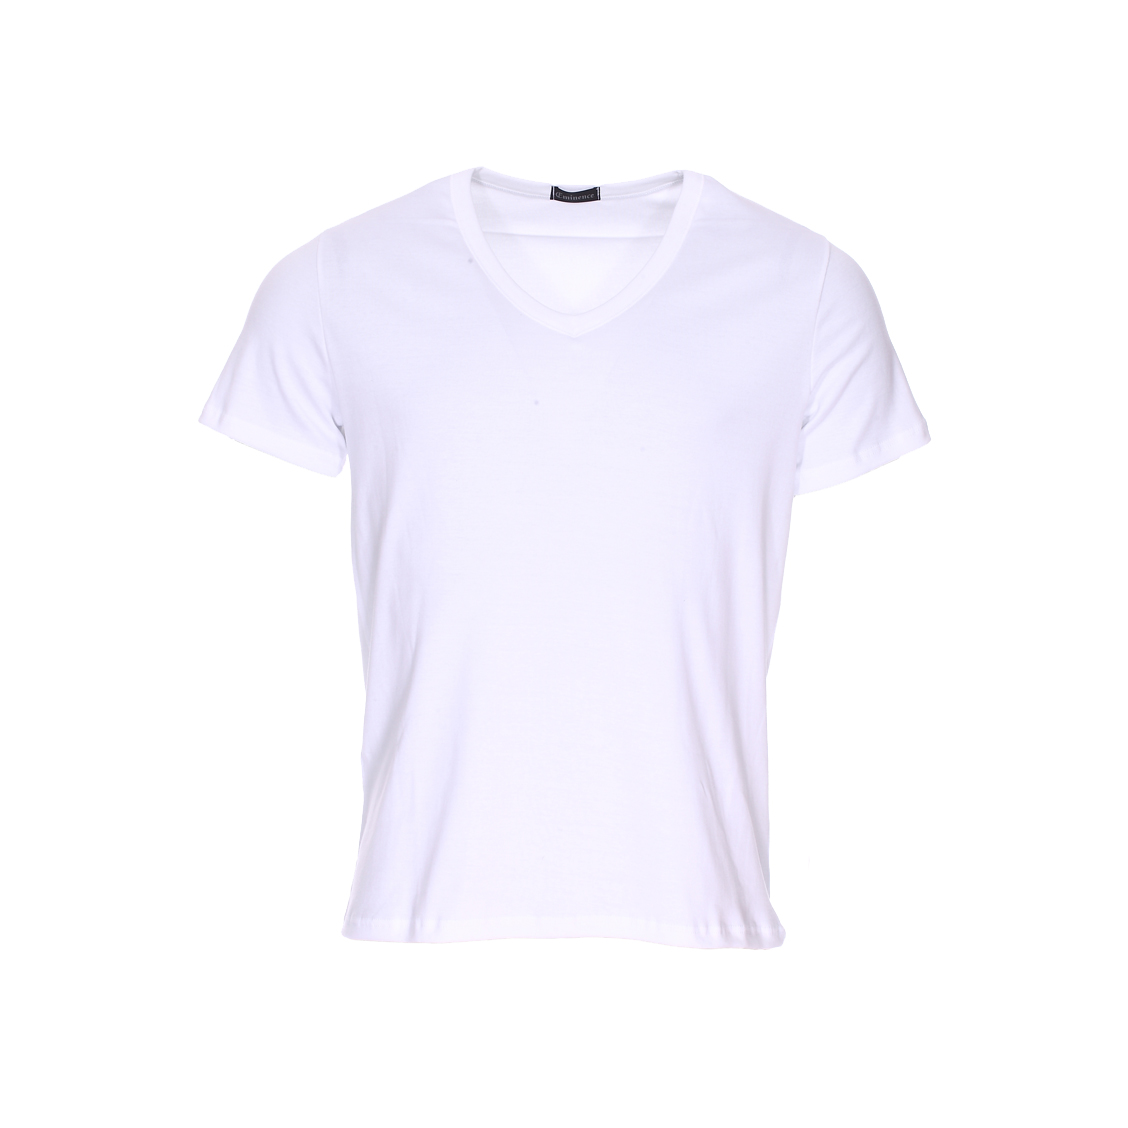 Tee-shirt col V Eminence L'Optimum en coton blanc, tissu français